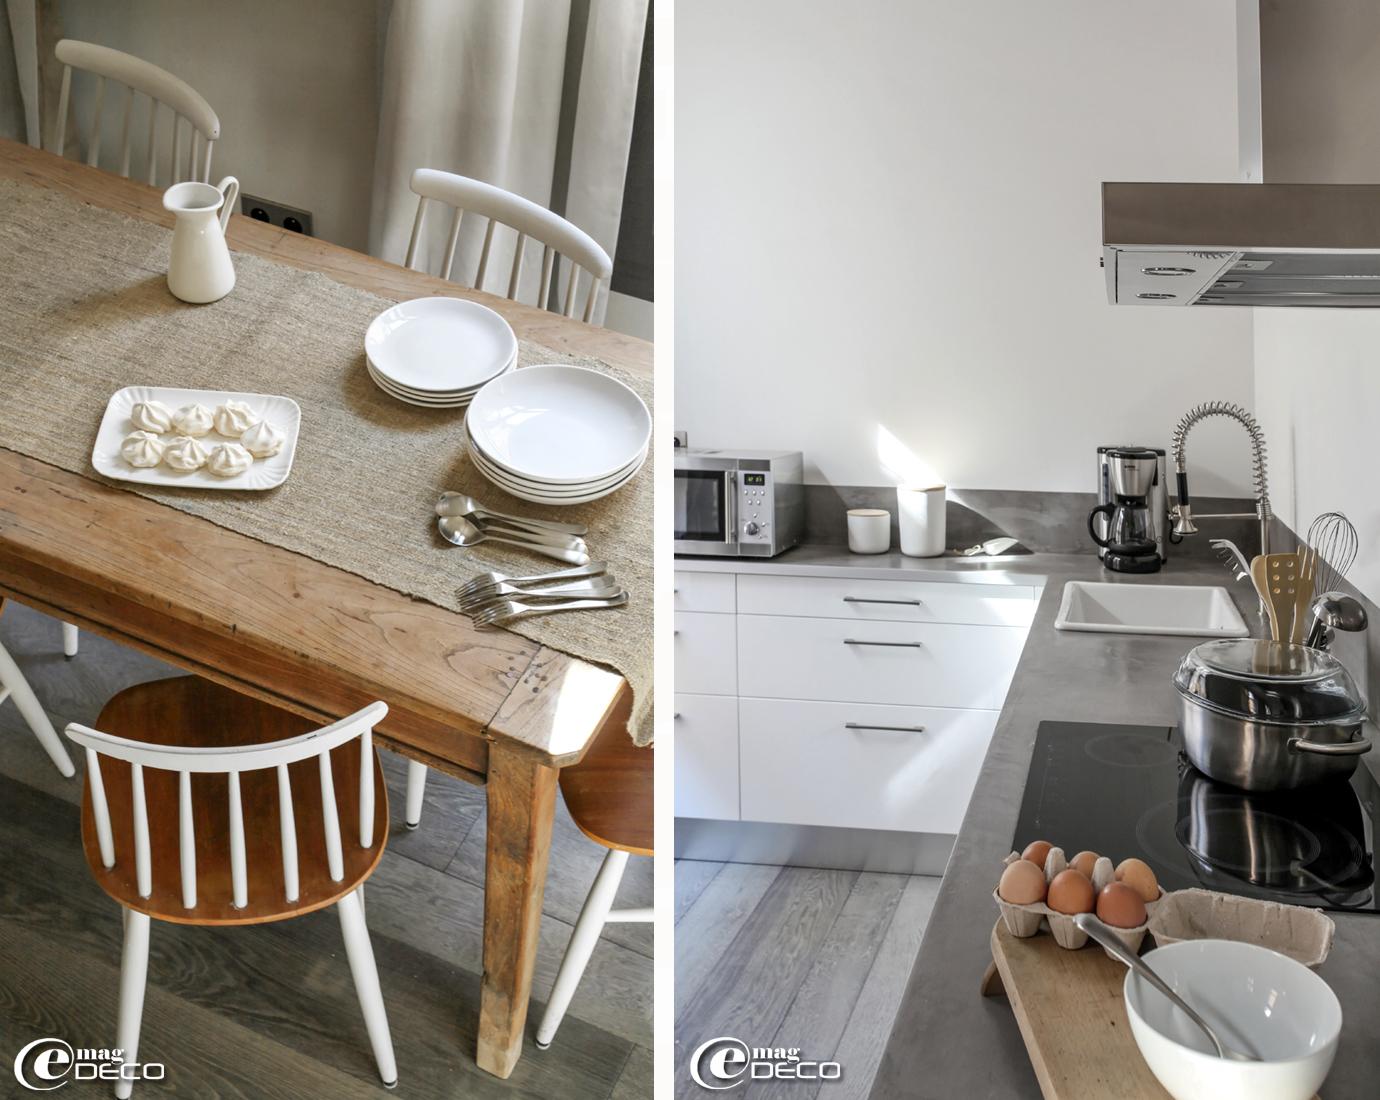 Vaisselle et pichet Ikea, plat Seletti, chaises suédoises Ilmari Tapiovaara repeintes par Nathalie Vingot Mei